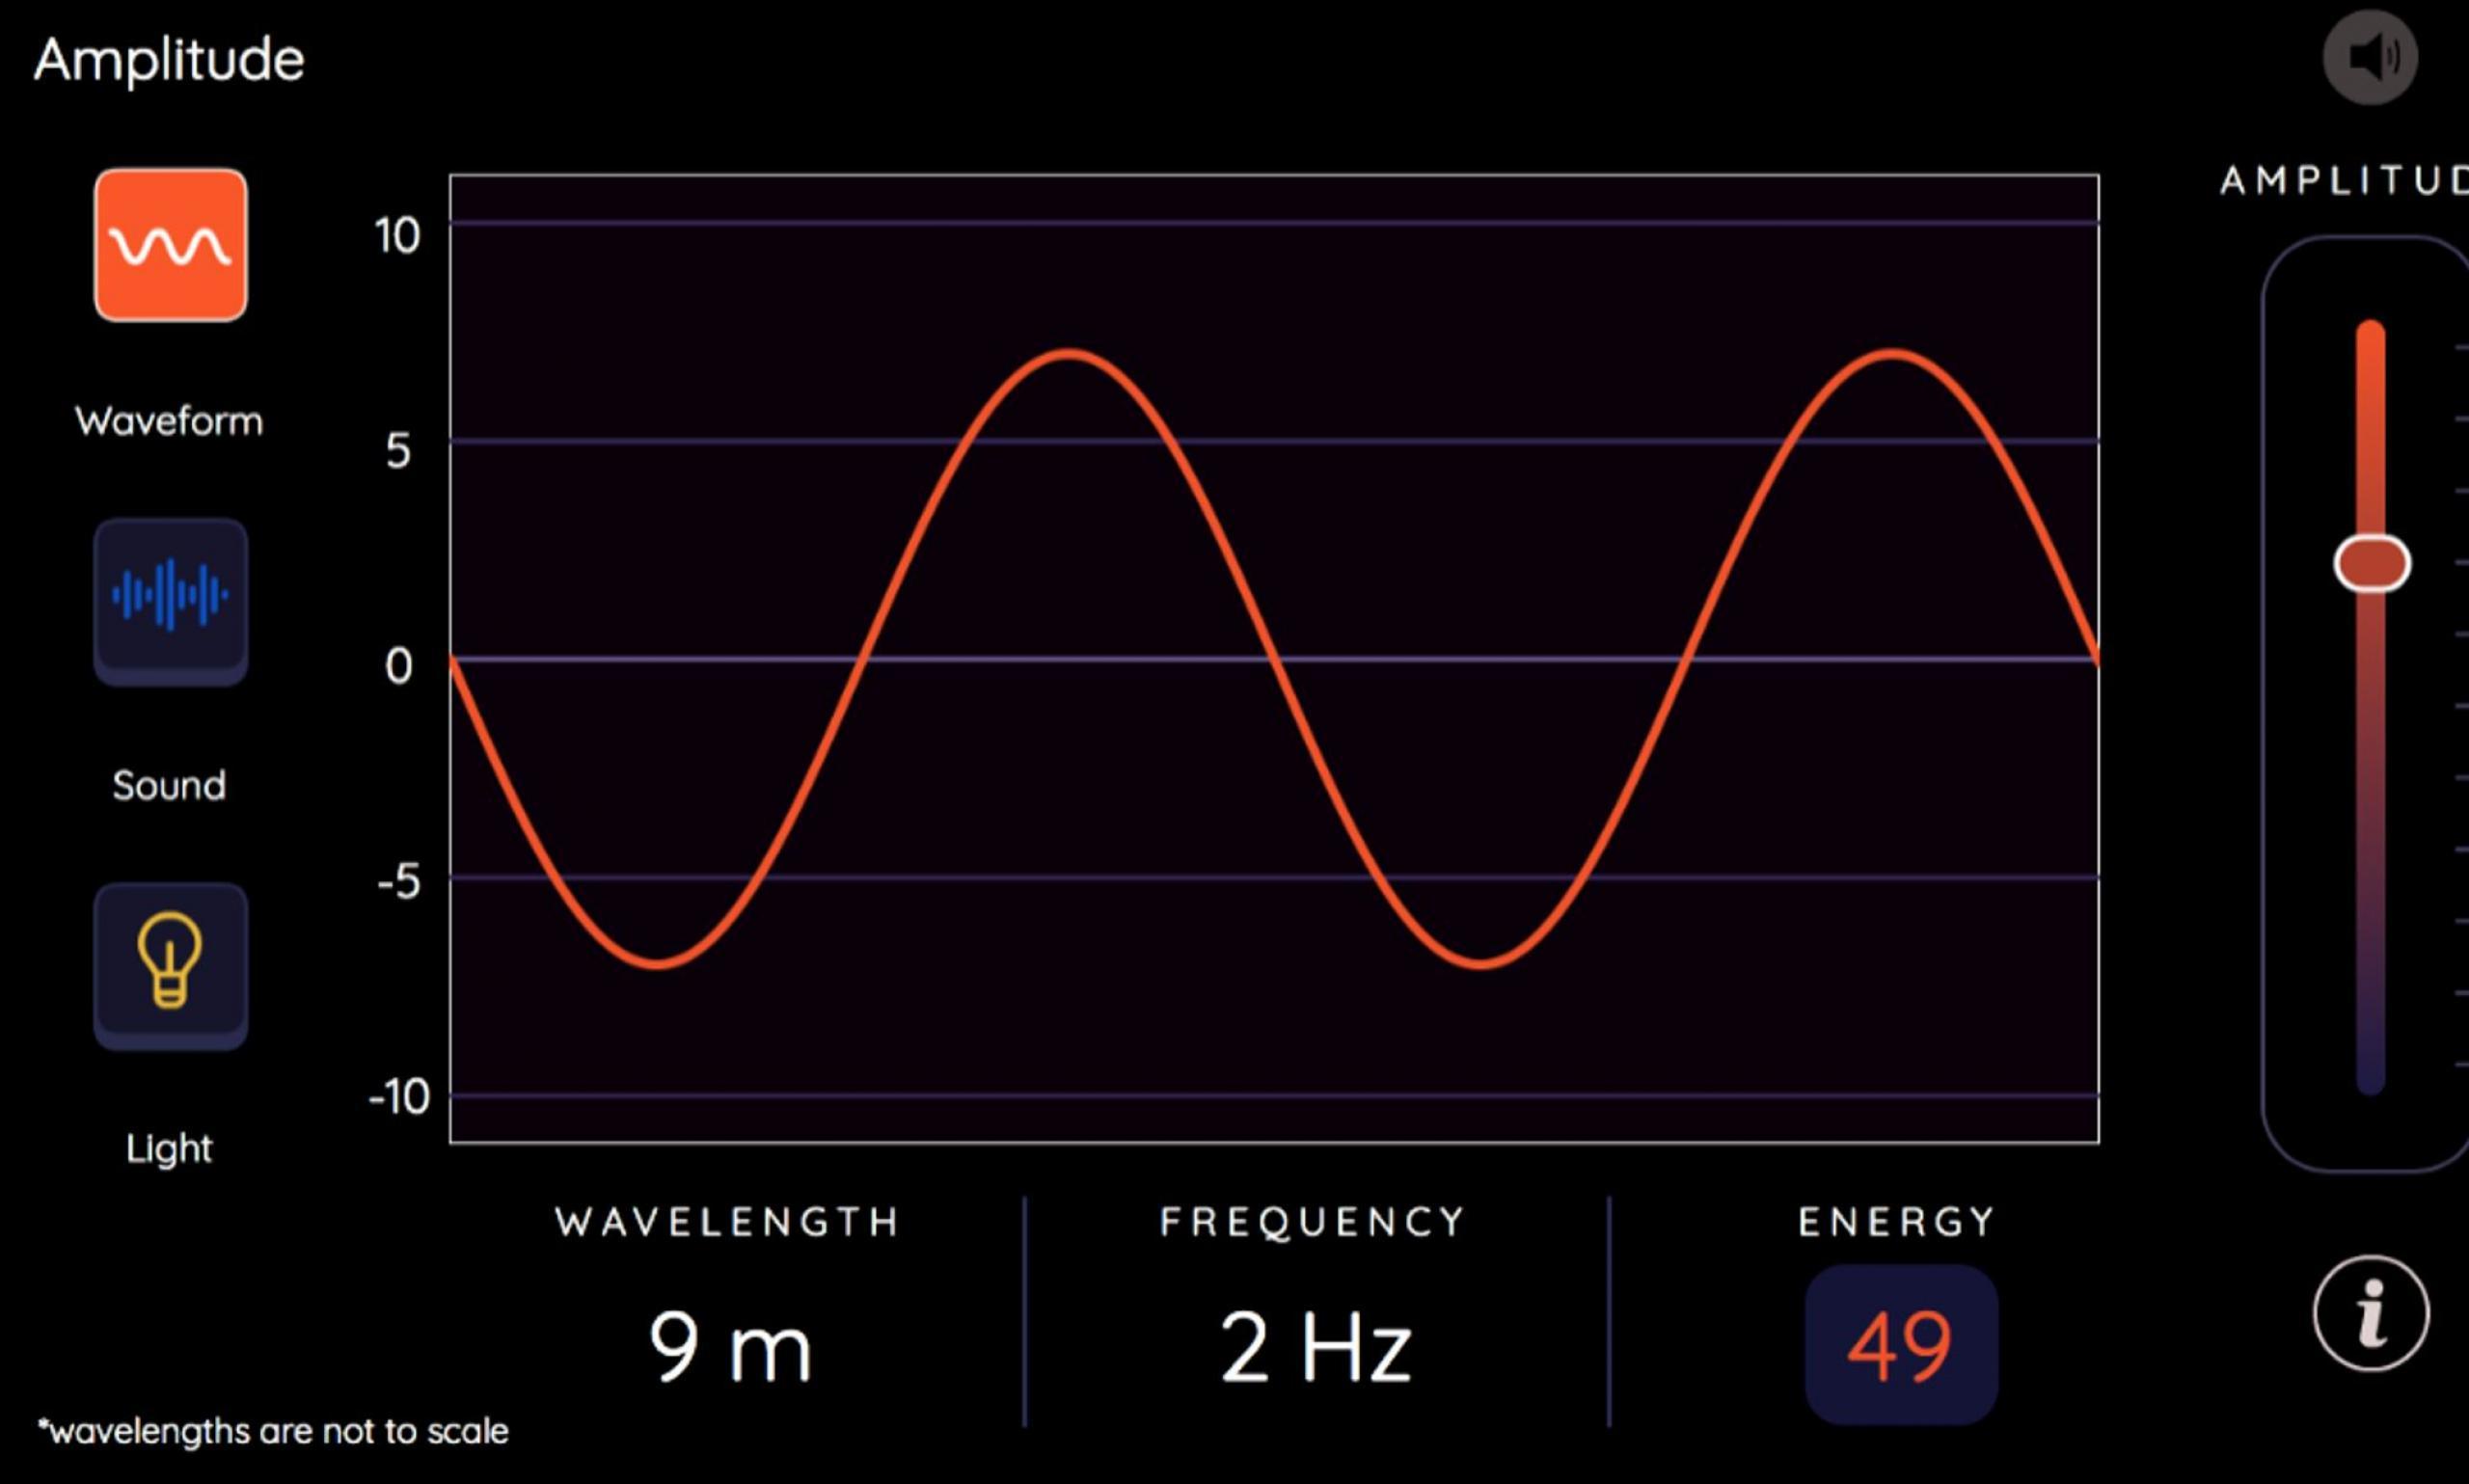 Screenshot from a waveform app